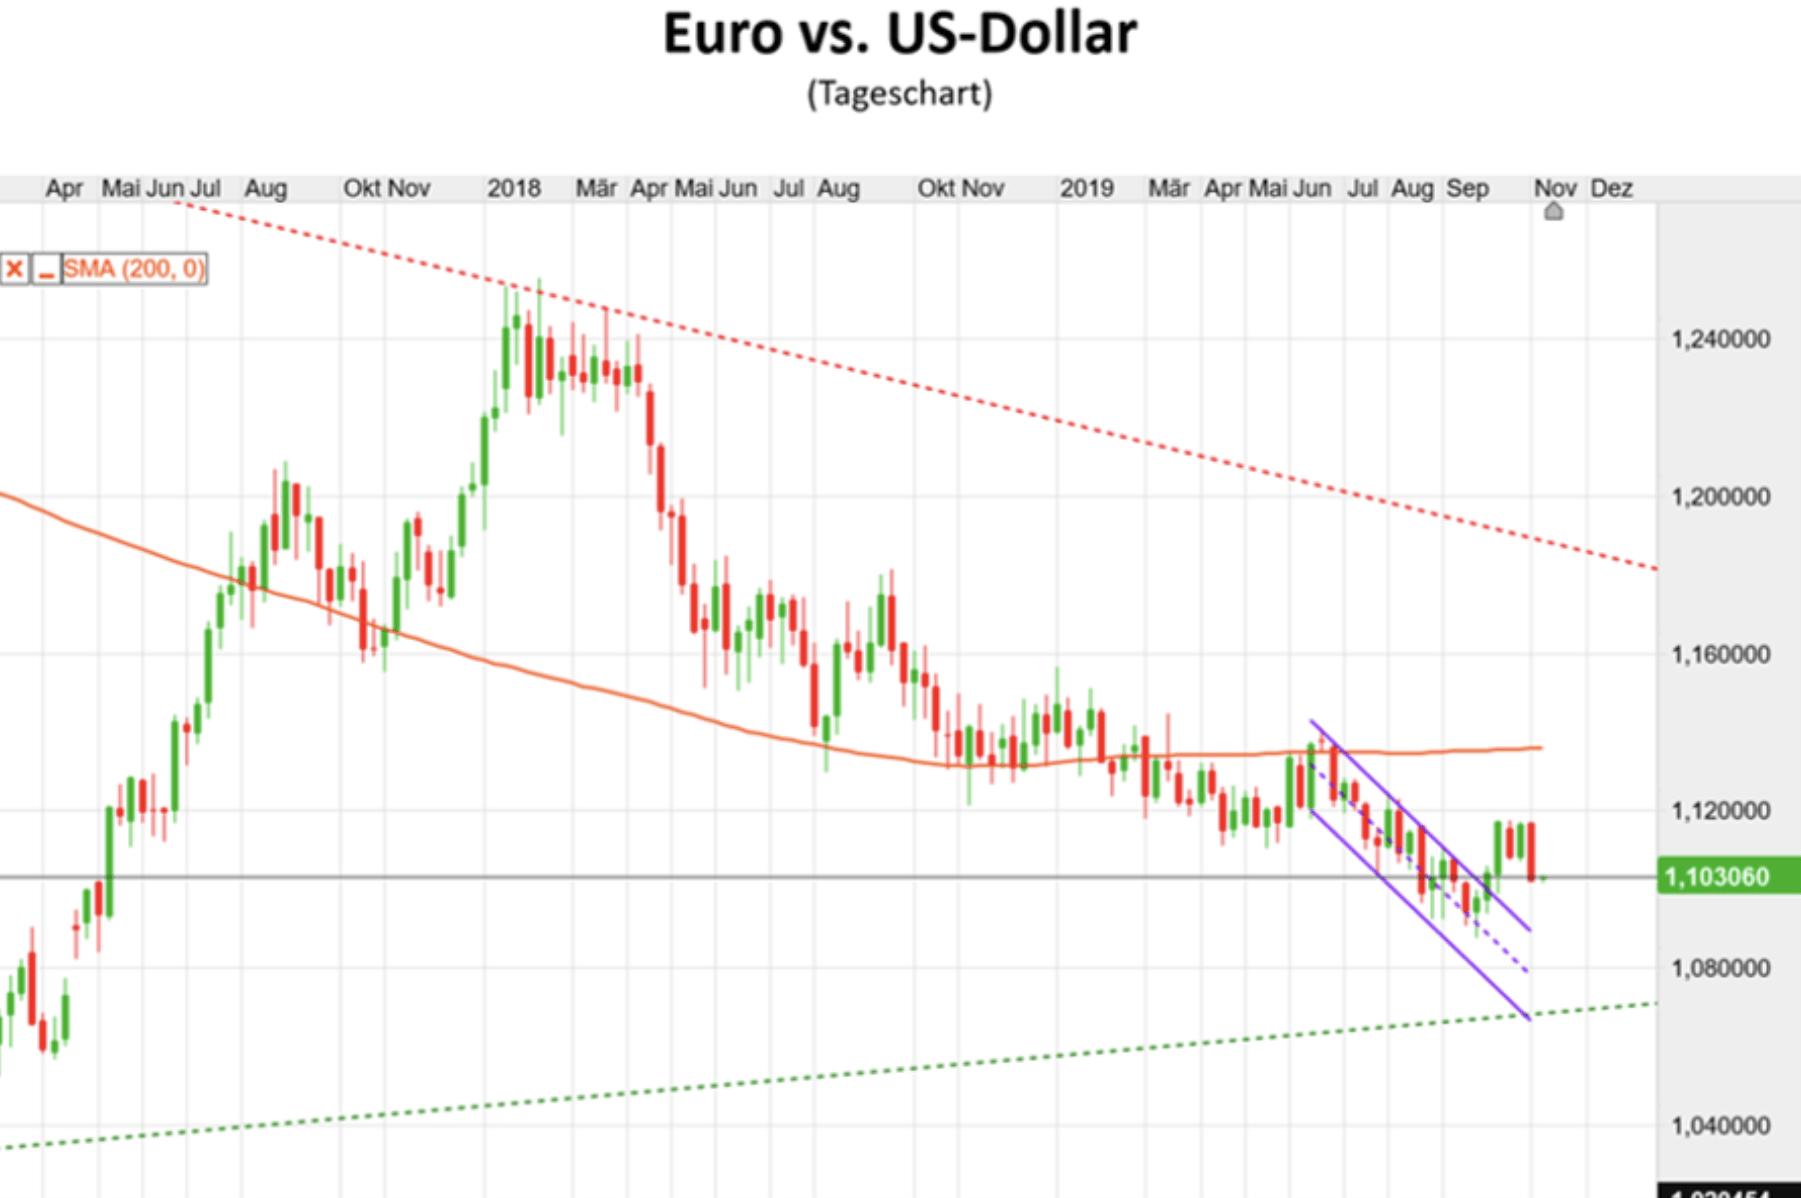 Euro vs US-Dollar im Tageschart